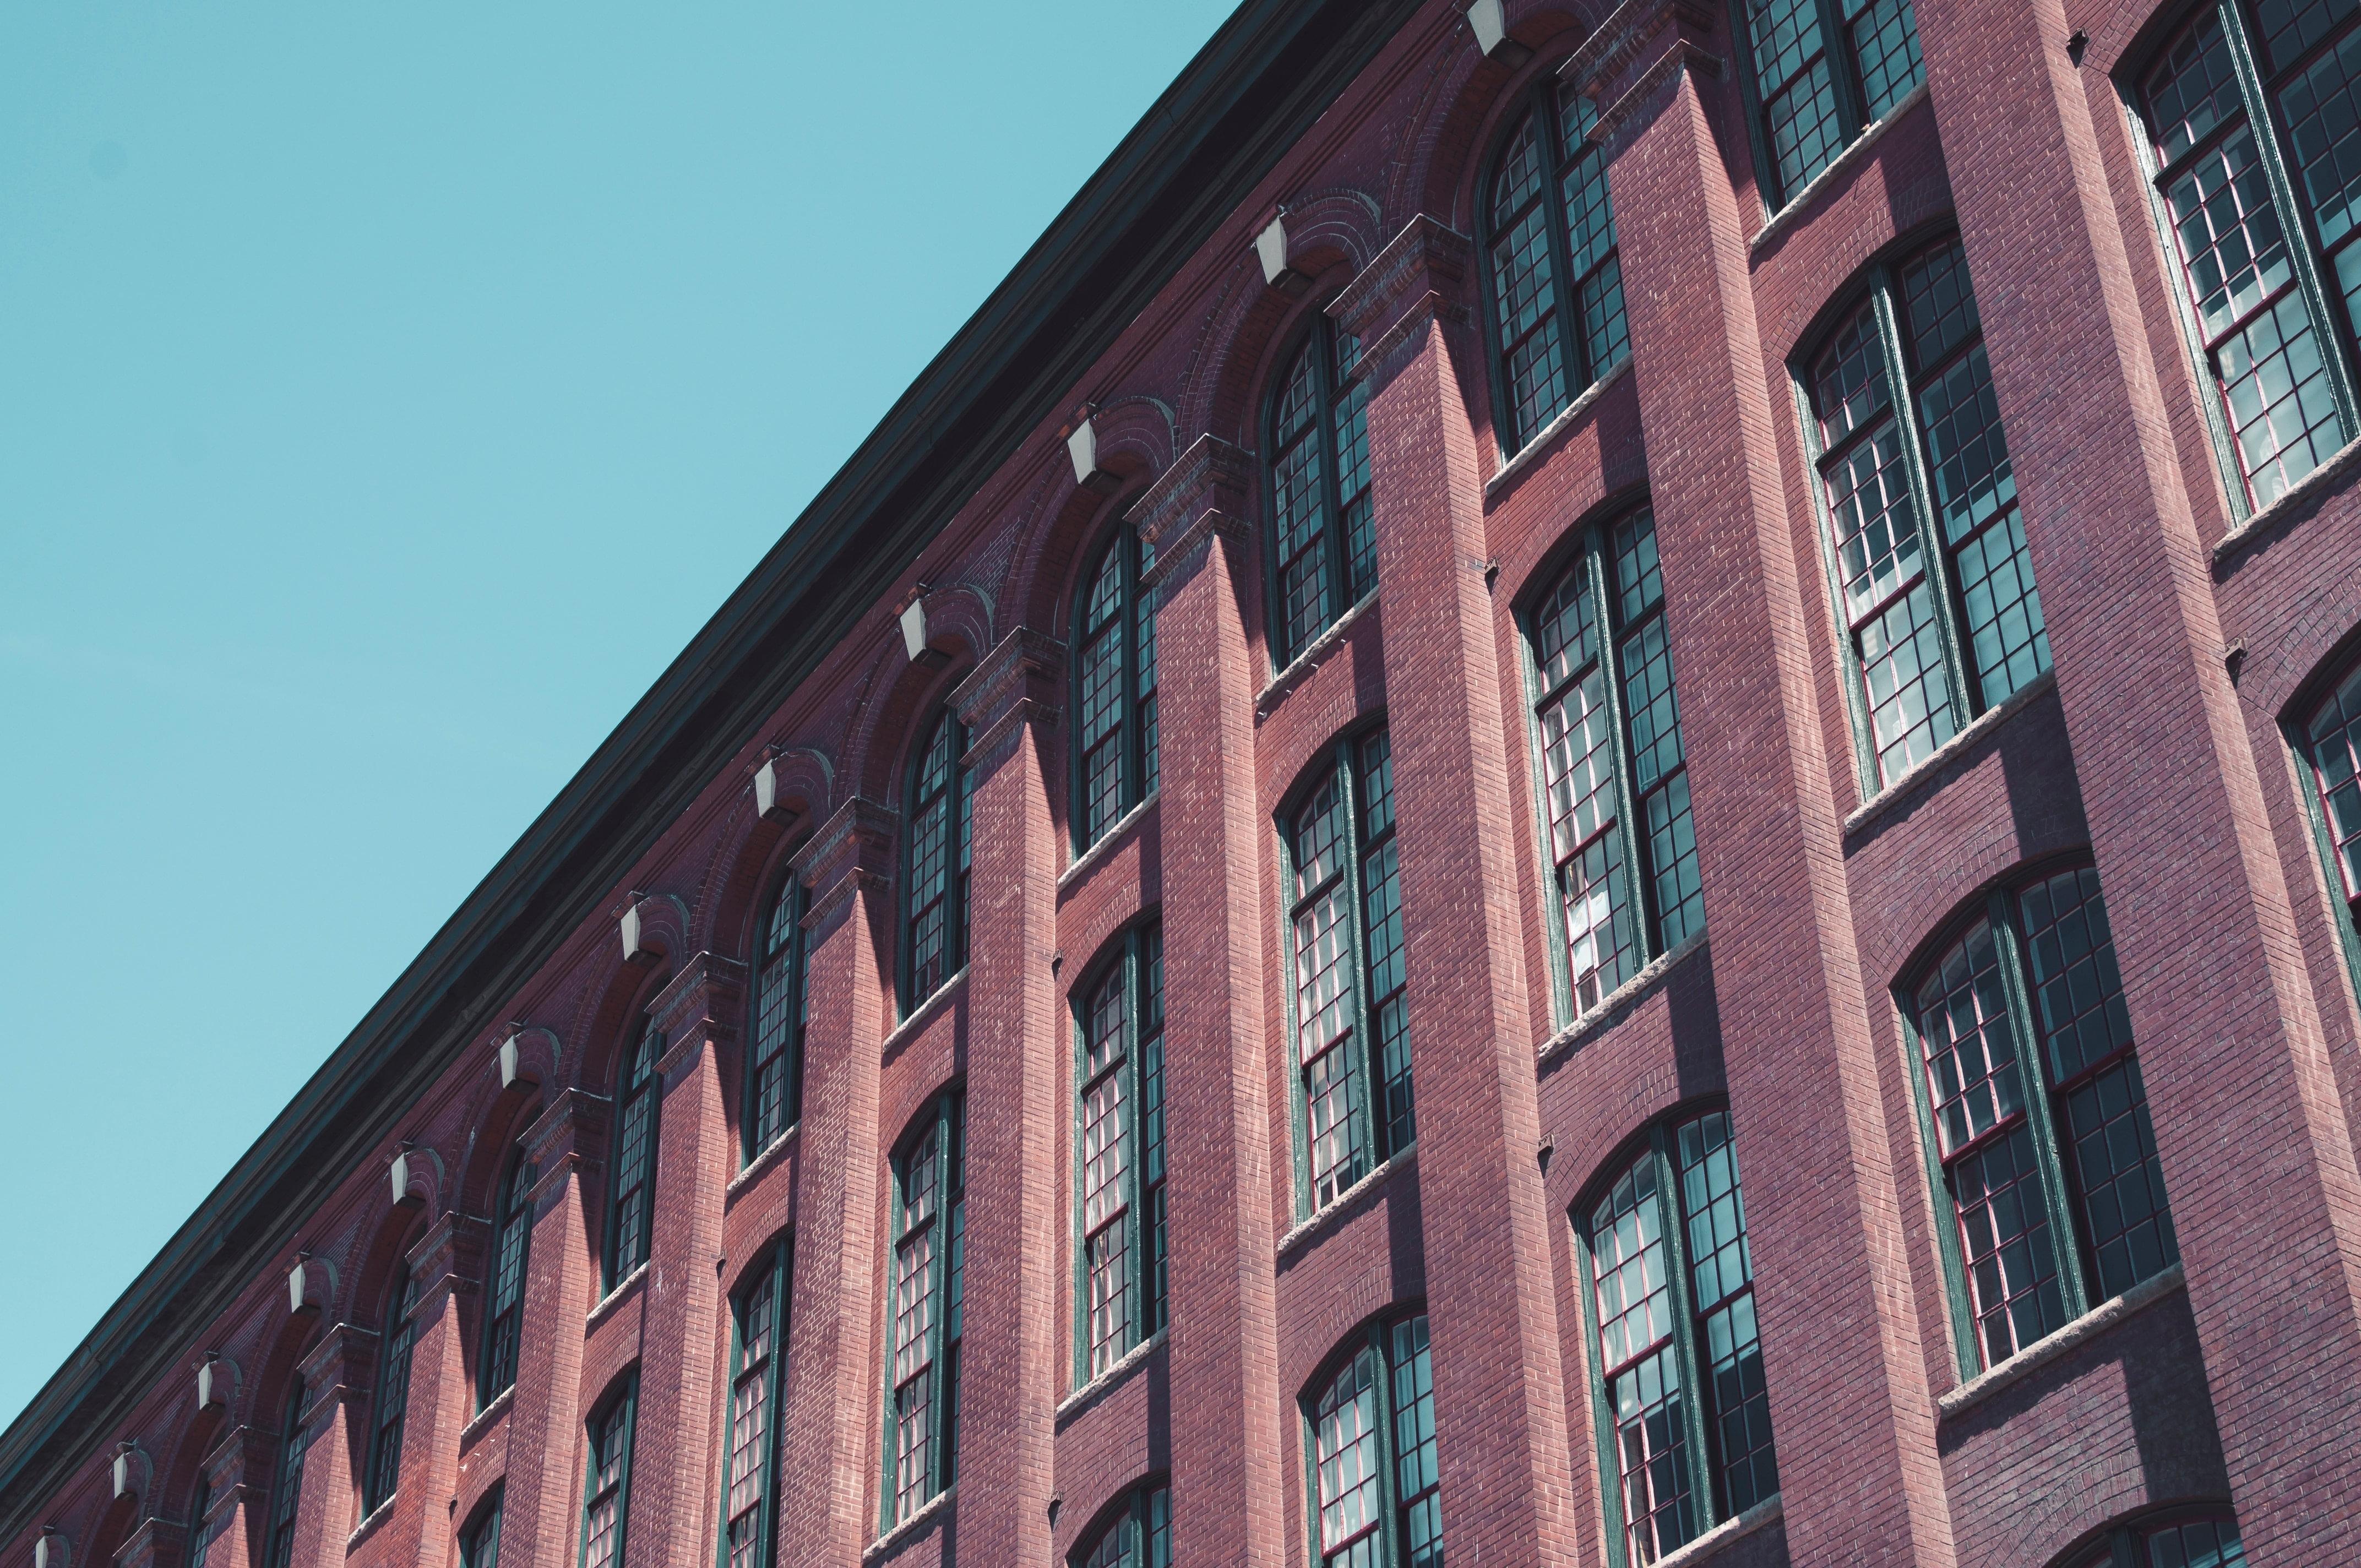 Brown concrete building, Facade, Windows, Building HD wallpaper ...